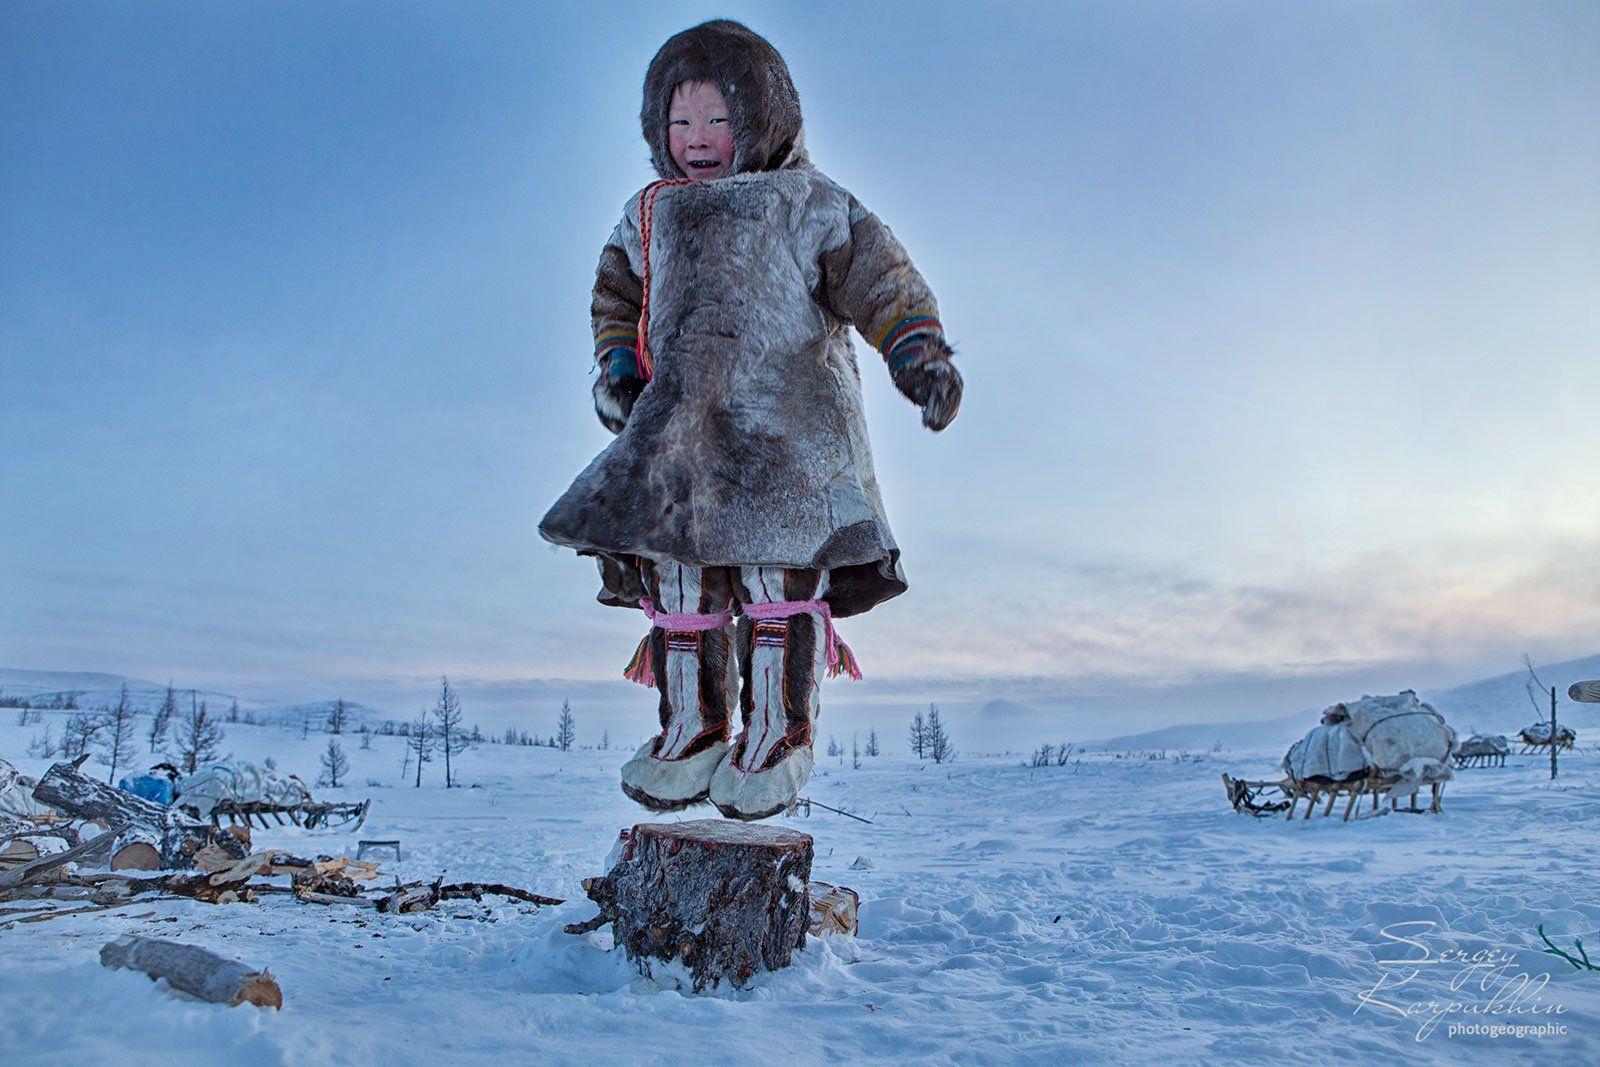 ямал, полярный урал, ненцы, Сергей Карпухин